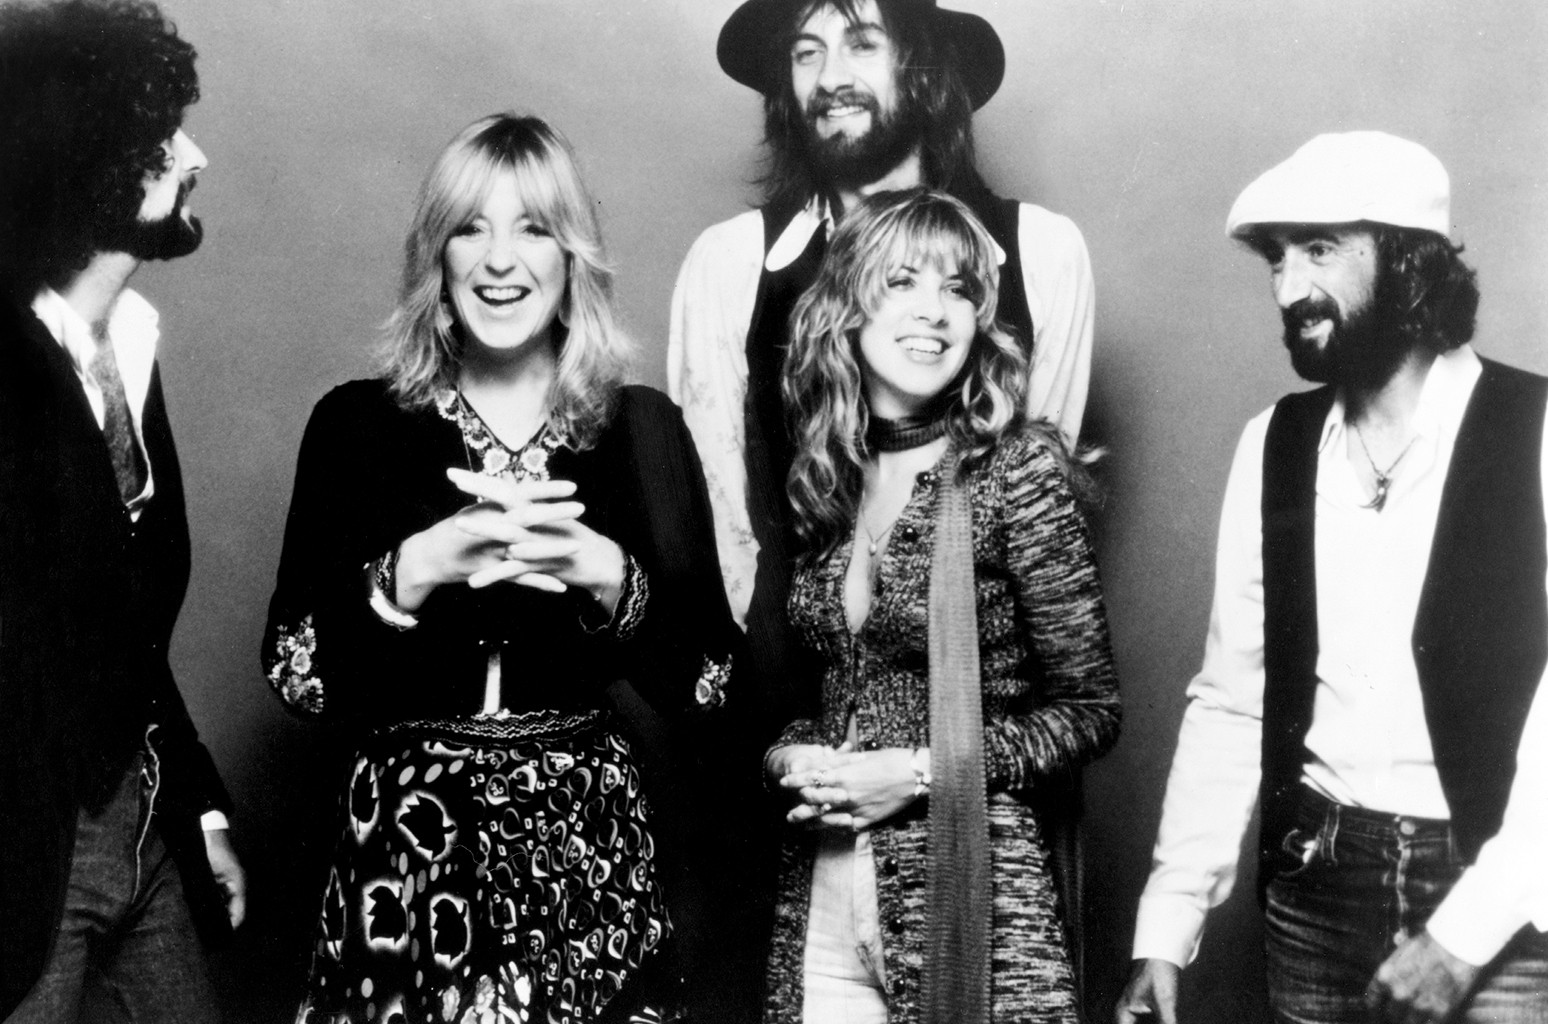 Fleetwood Mac photographed circa 1977